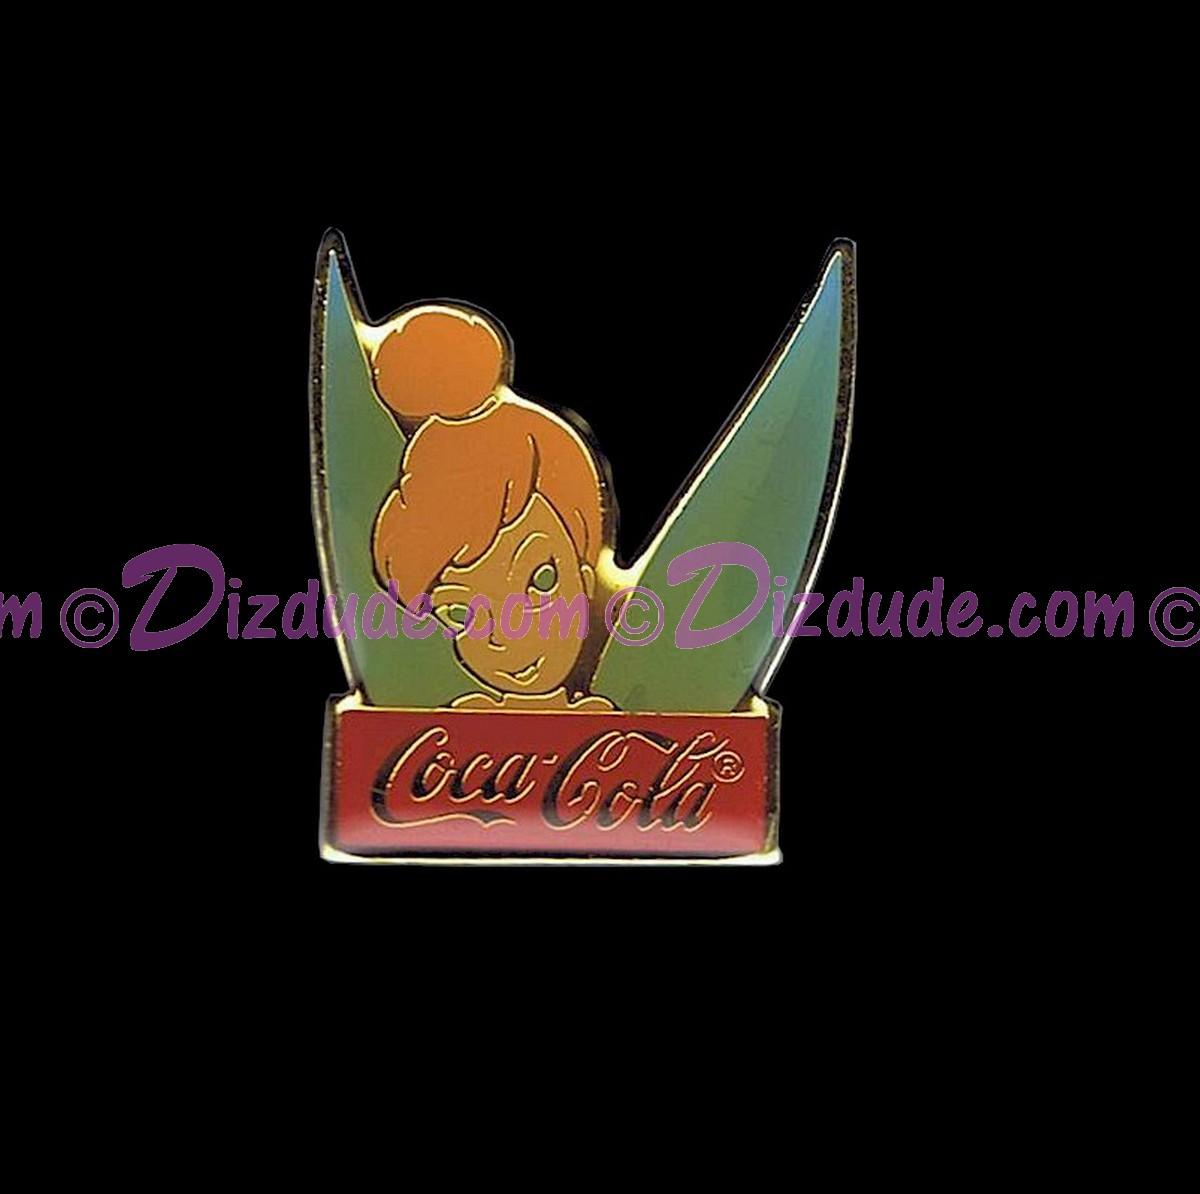 Walt Disney World 15th Anniversary Coca-Cola Framed Set (Tinker Bell) © Dizdude.com